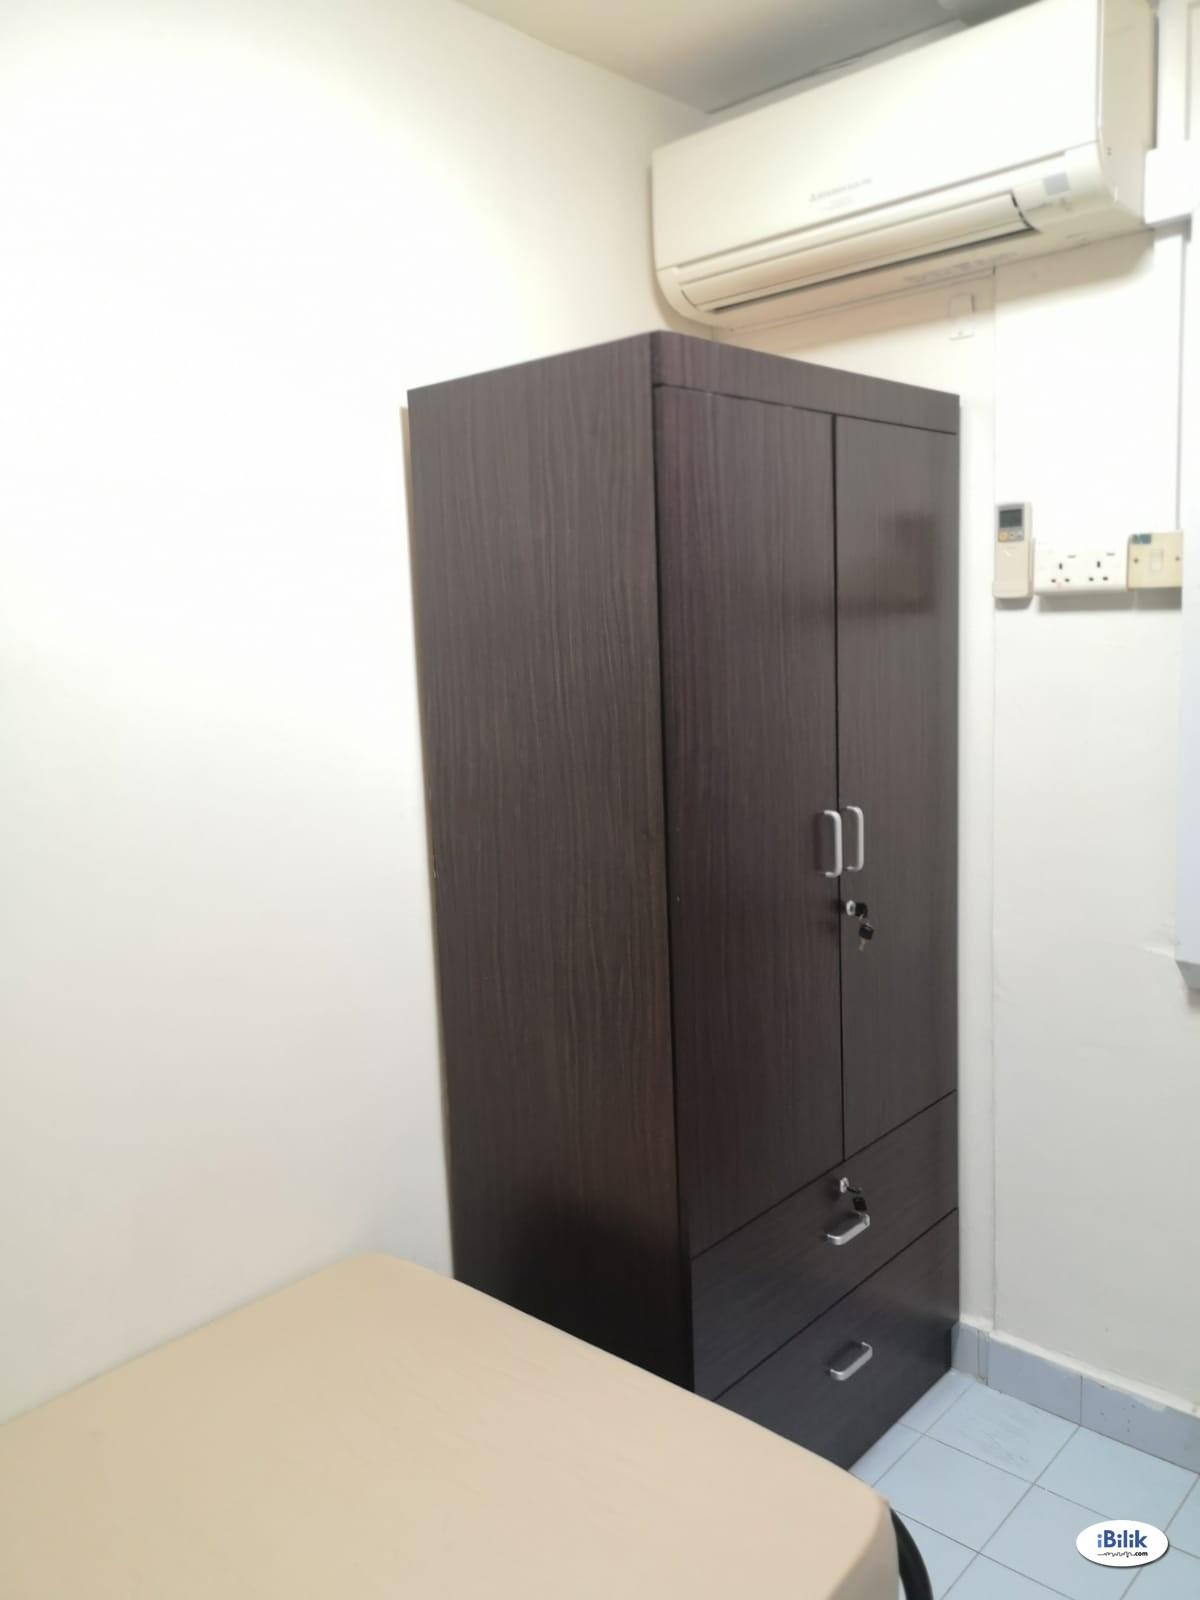 Single Room at Toa Payoh, Singapore